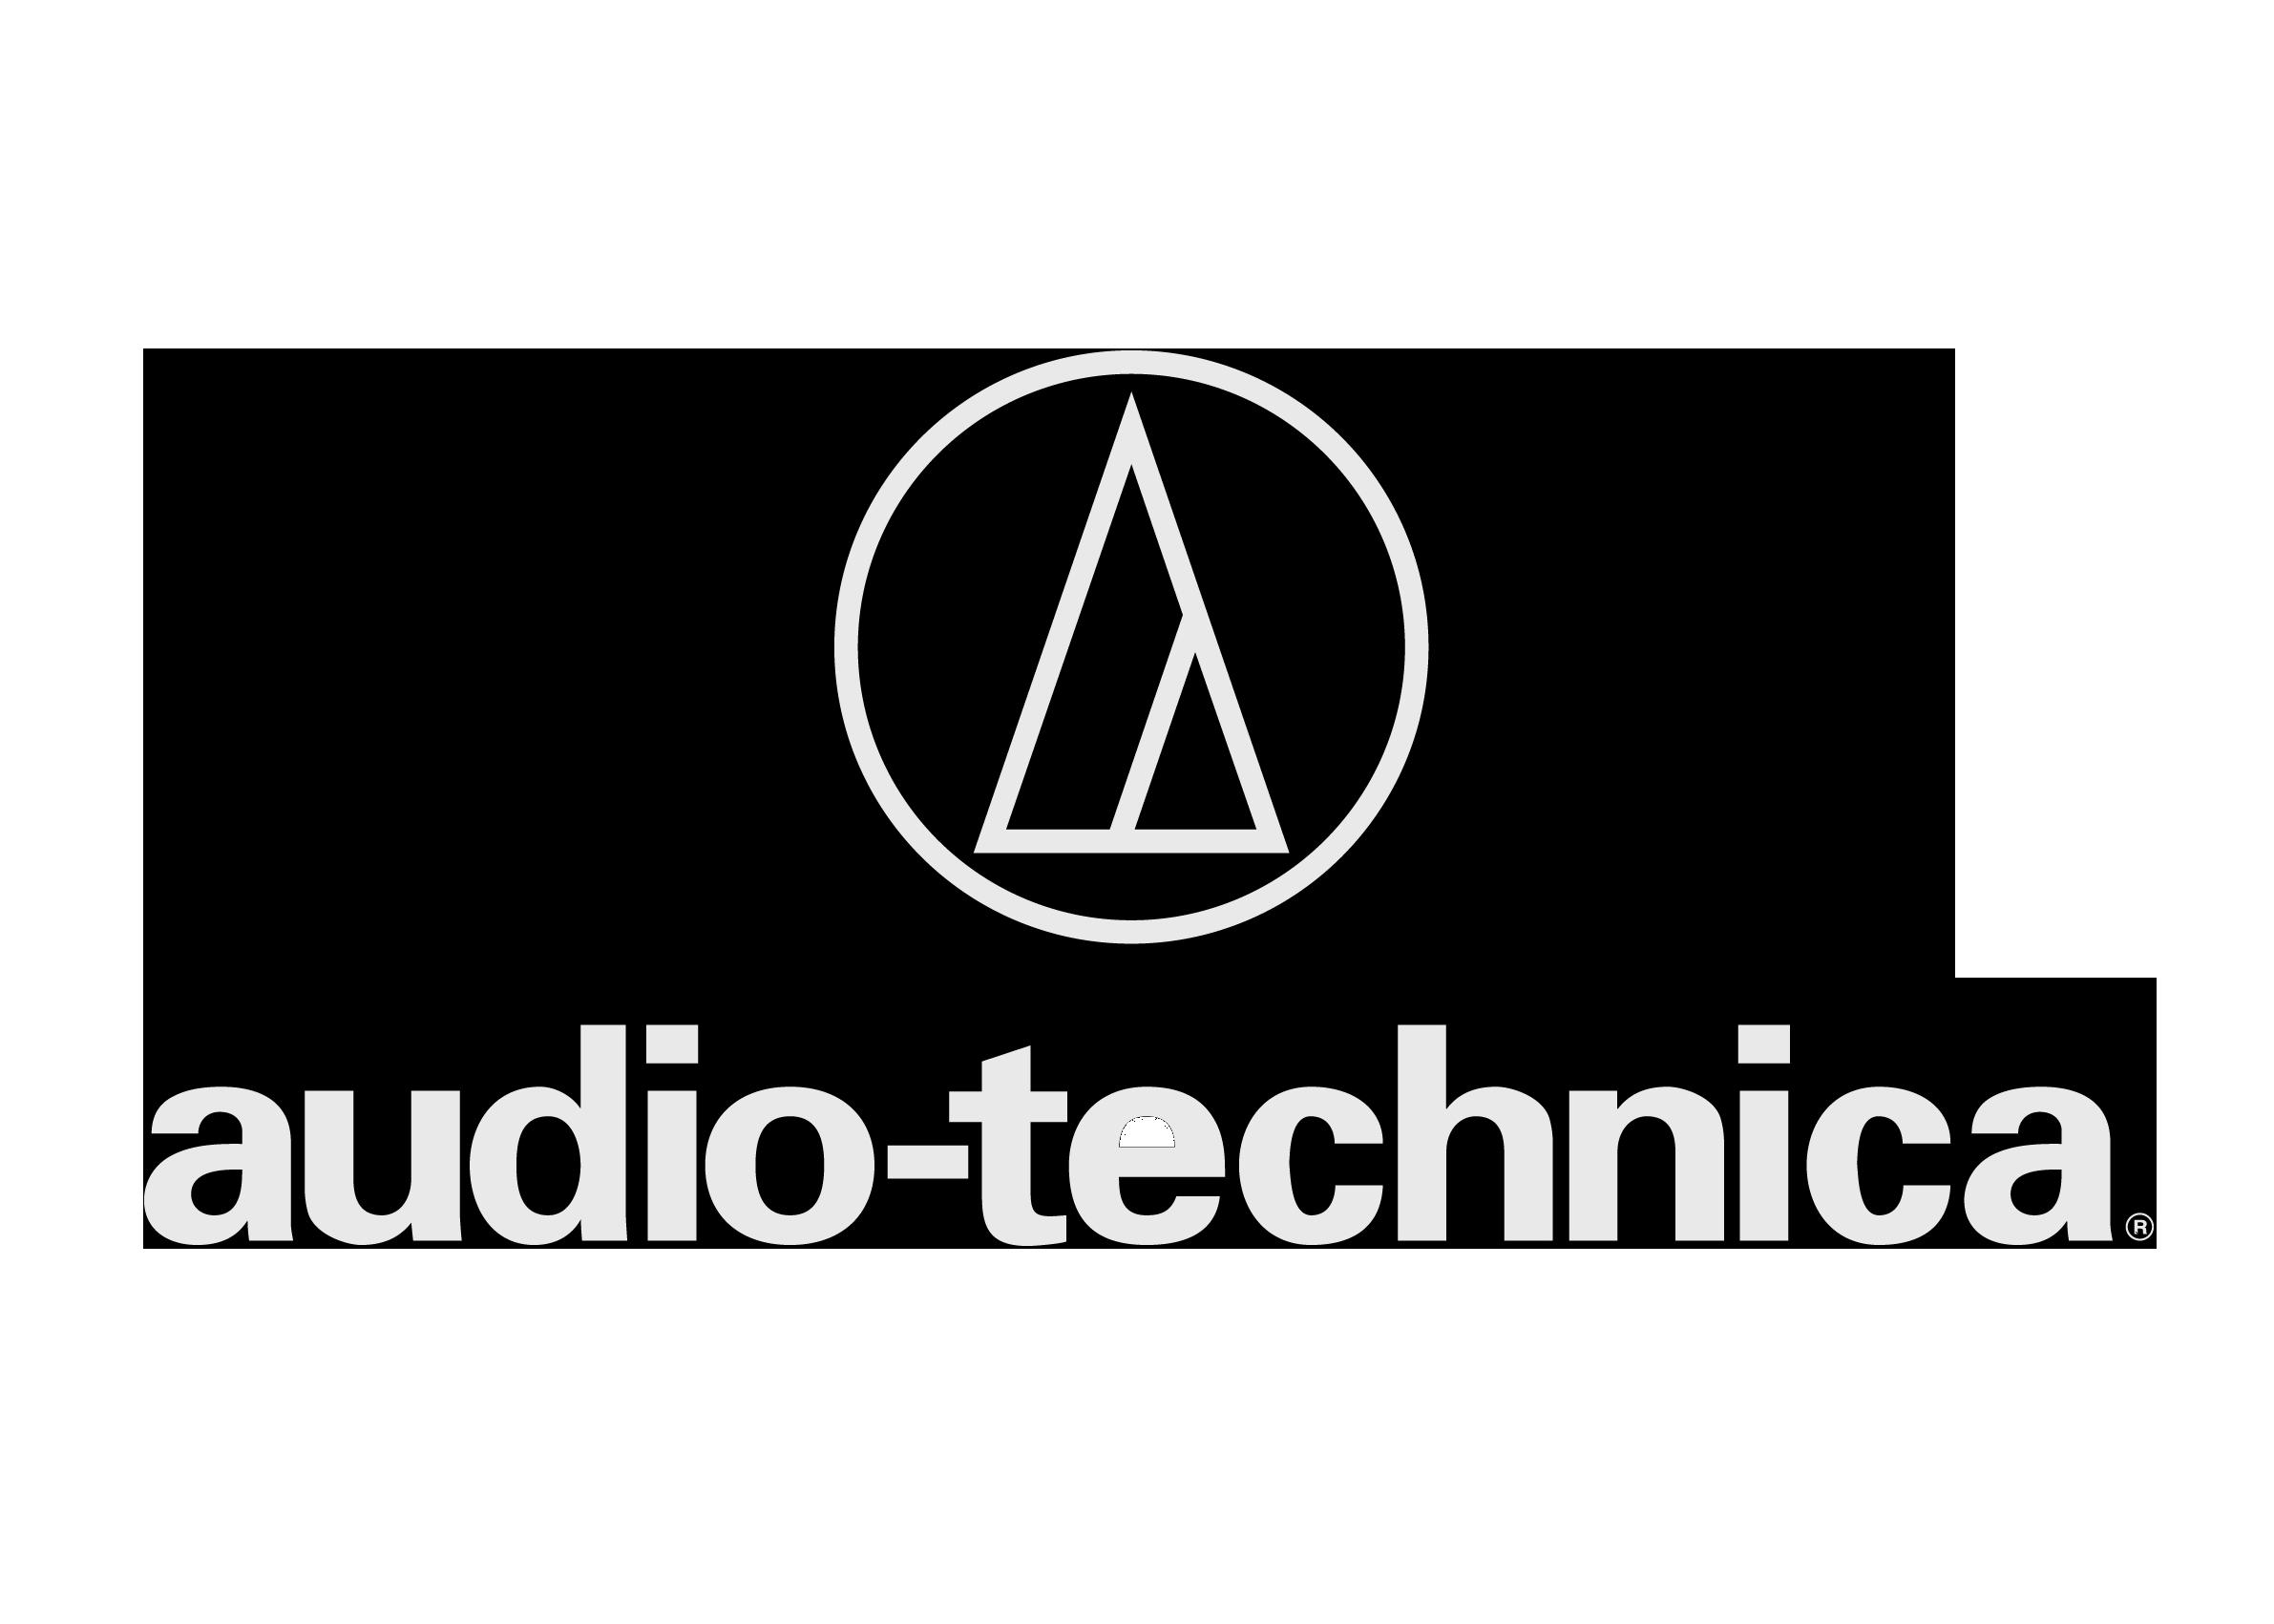 audio-technica.png